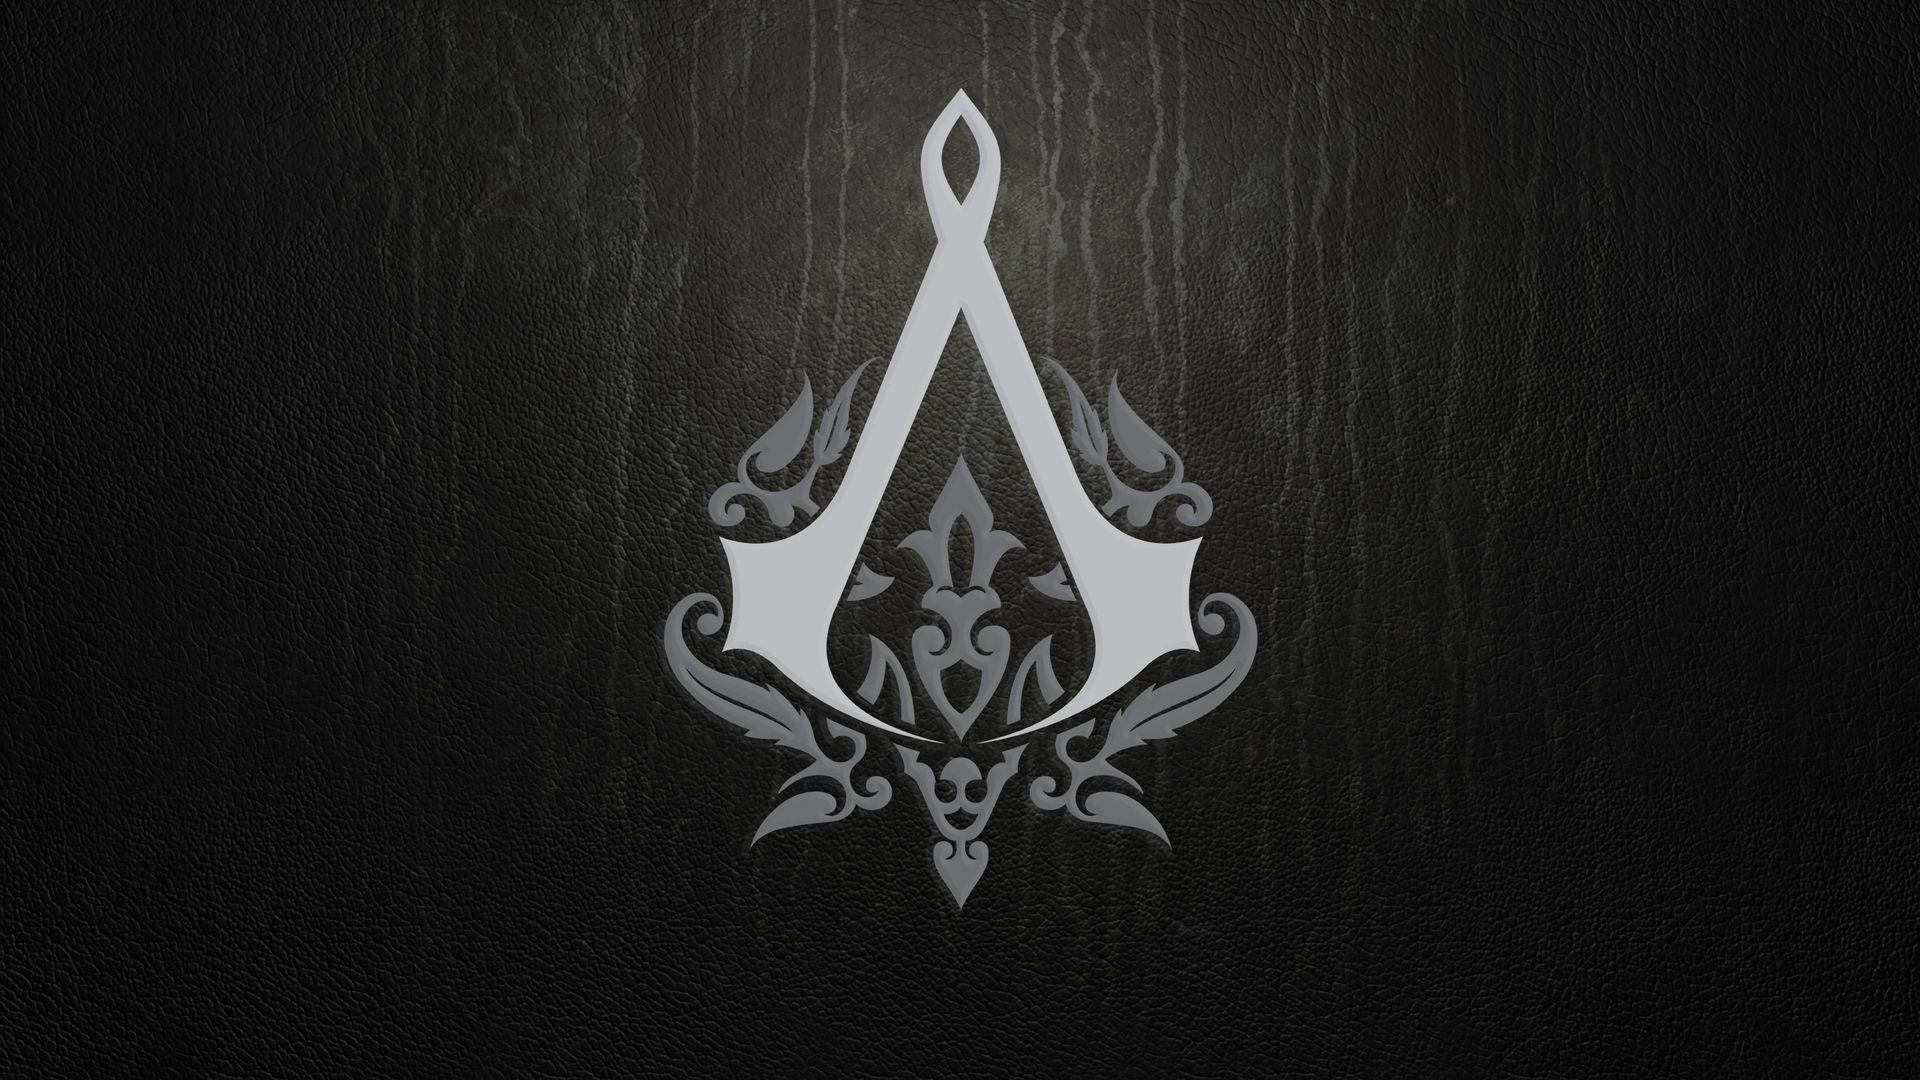 Assassins Creed Logo Wallpaper Photo Assassins Creed Logo